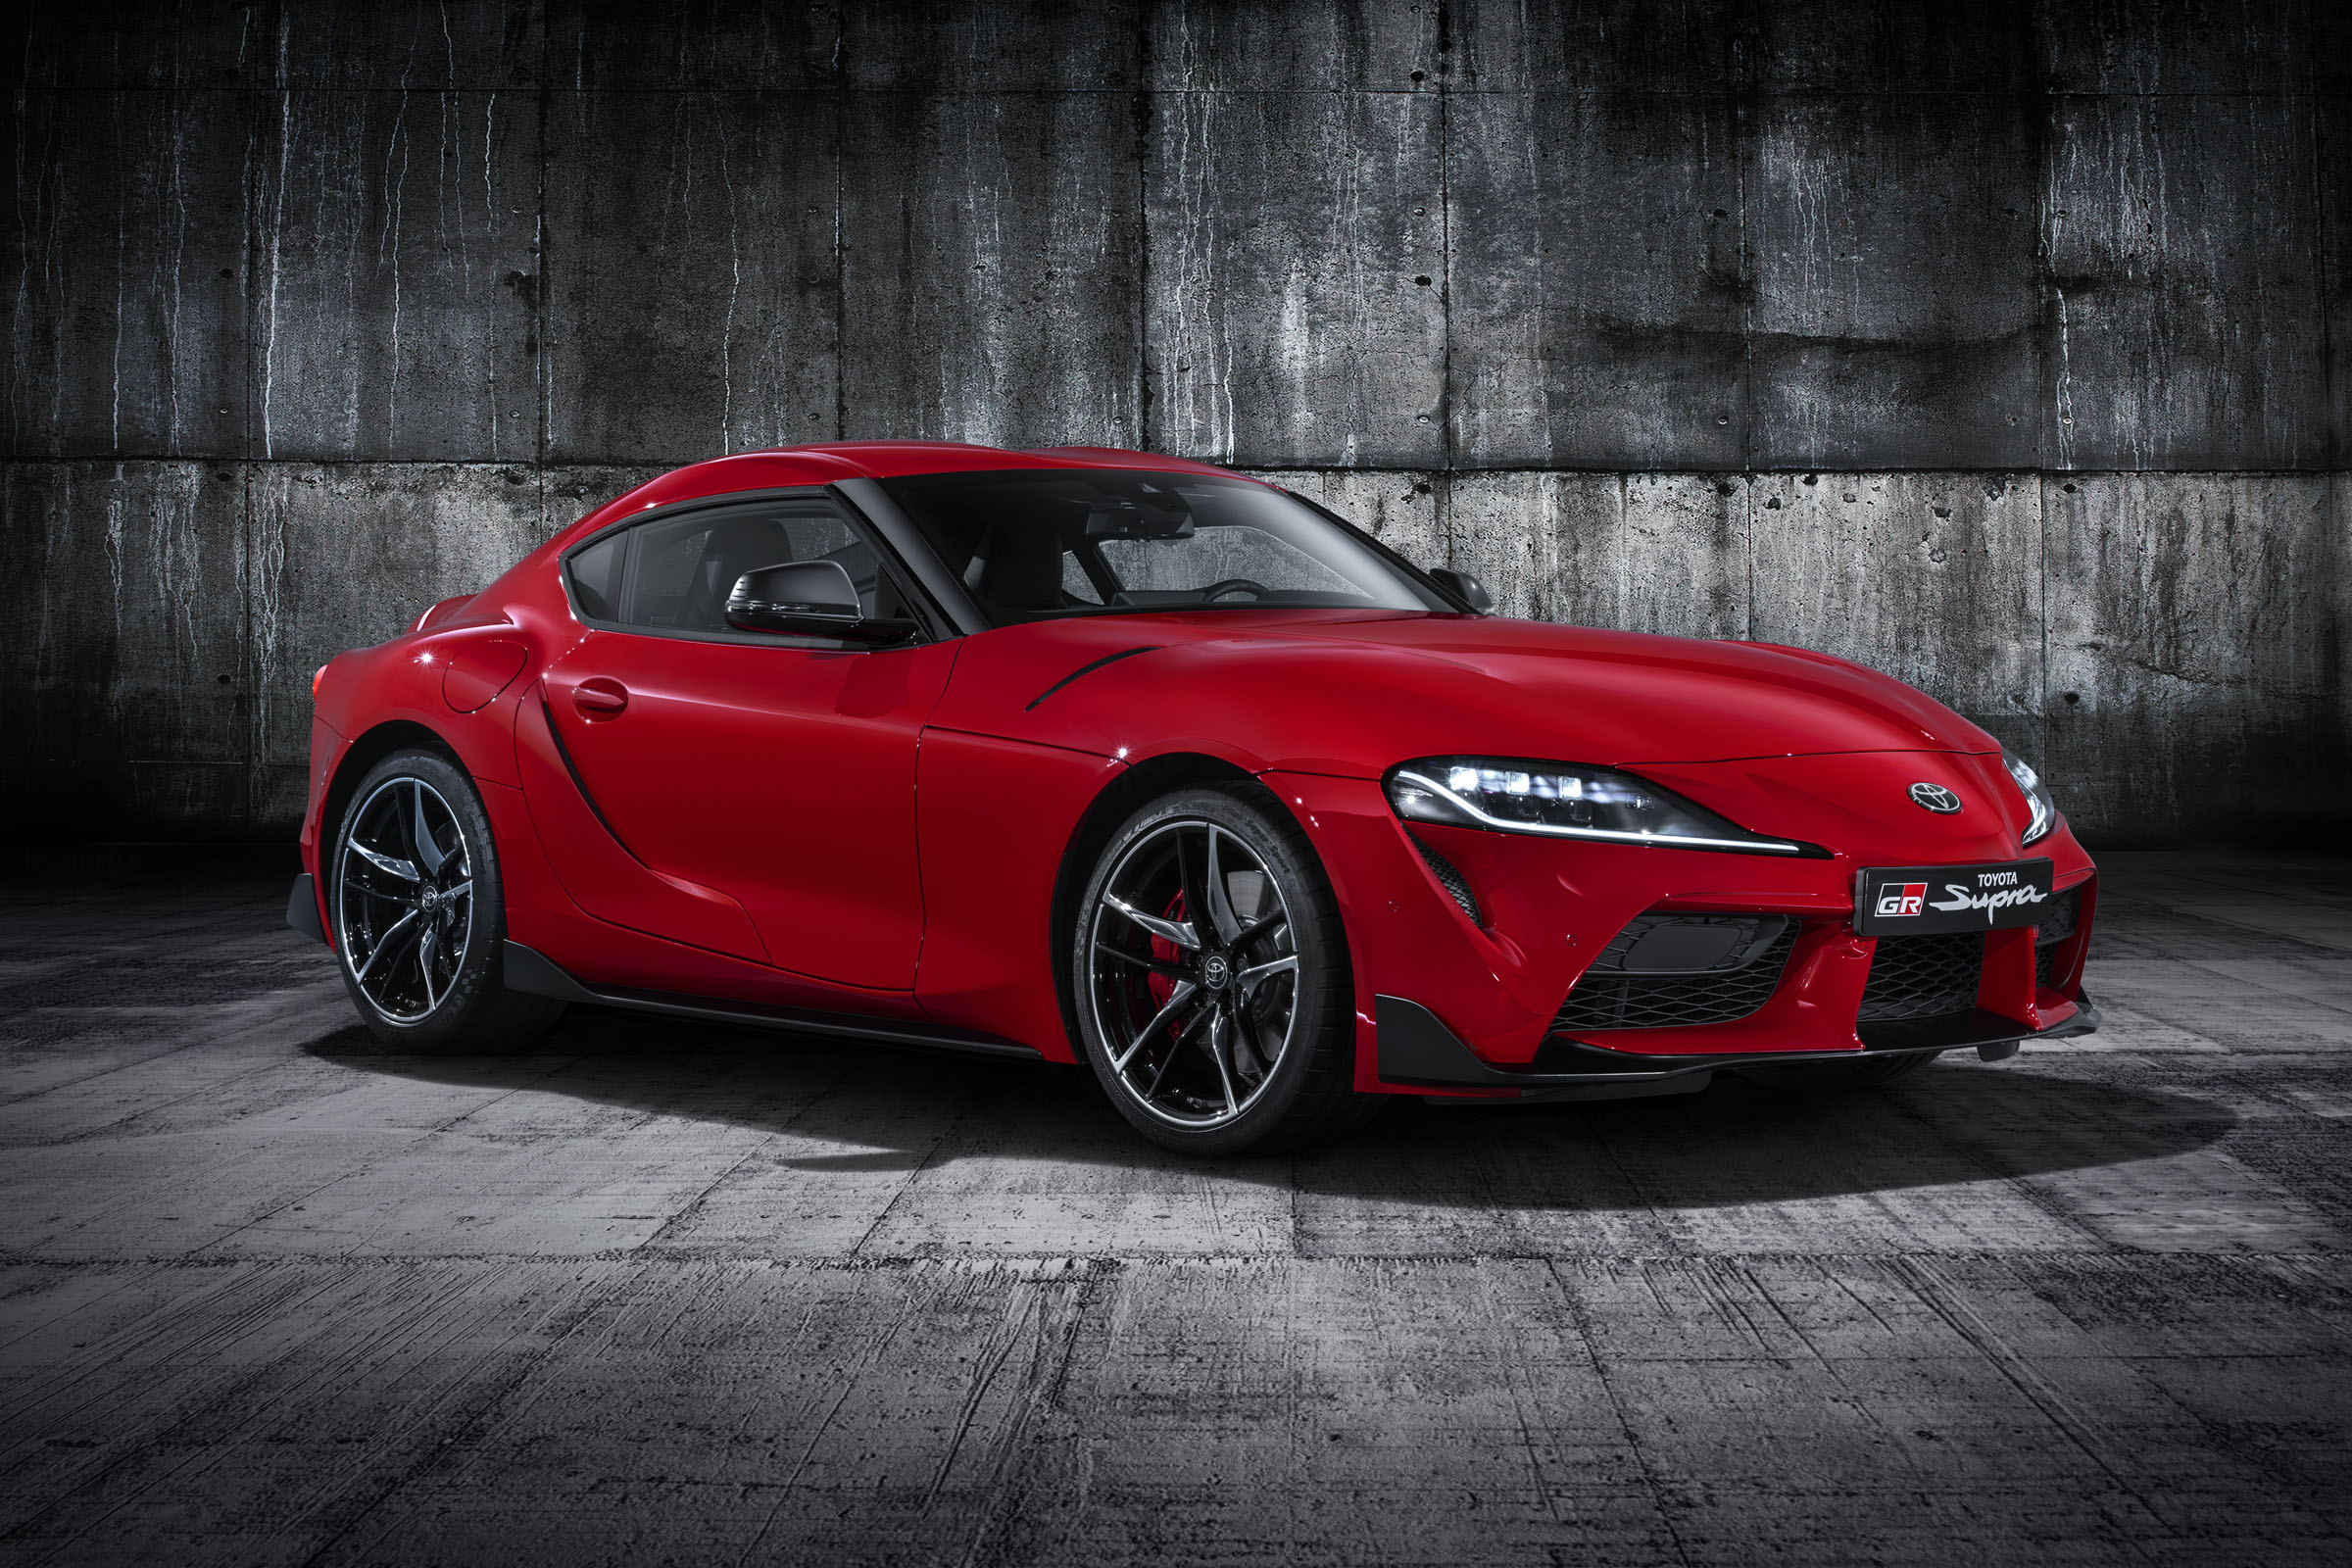 Kelebihan Toyota Supra 2019 Harga